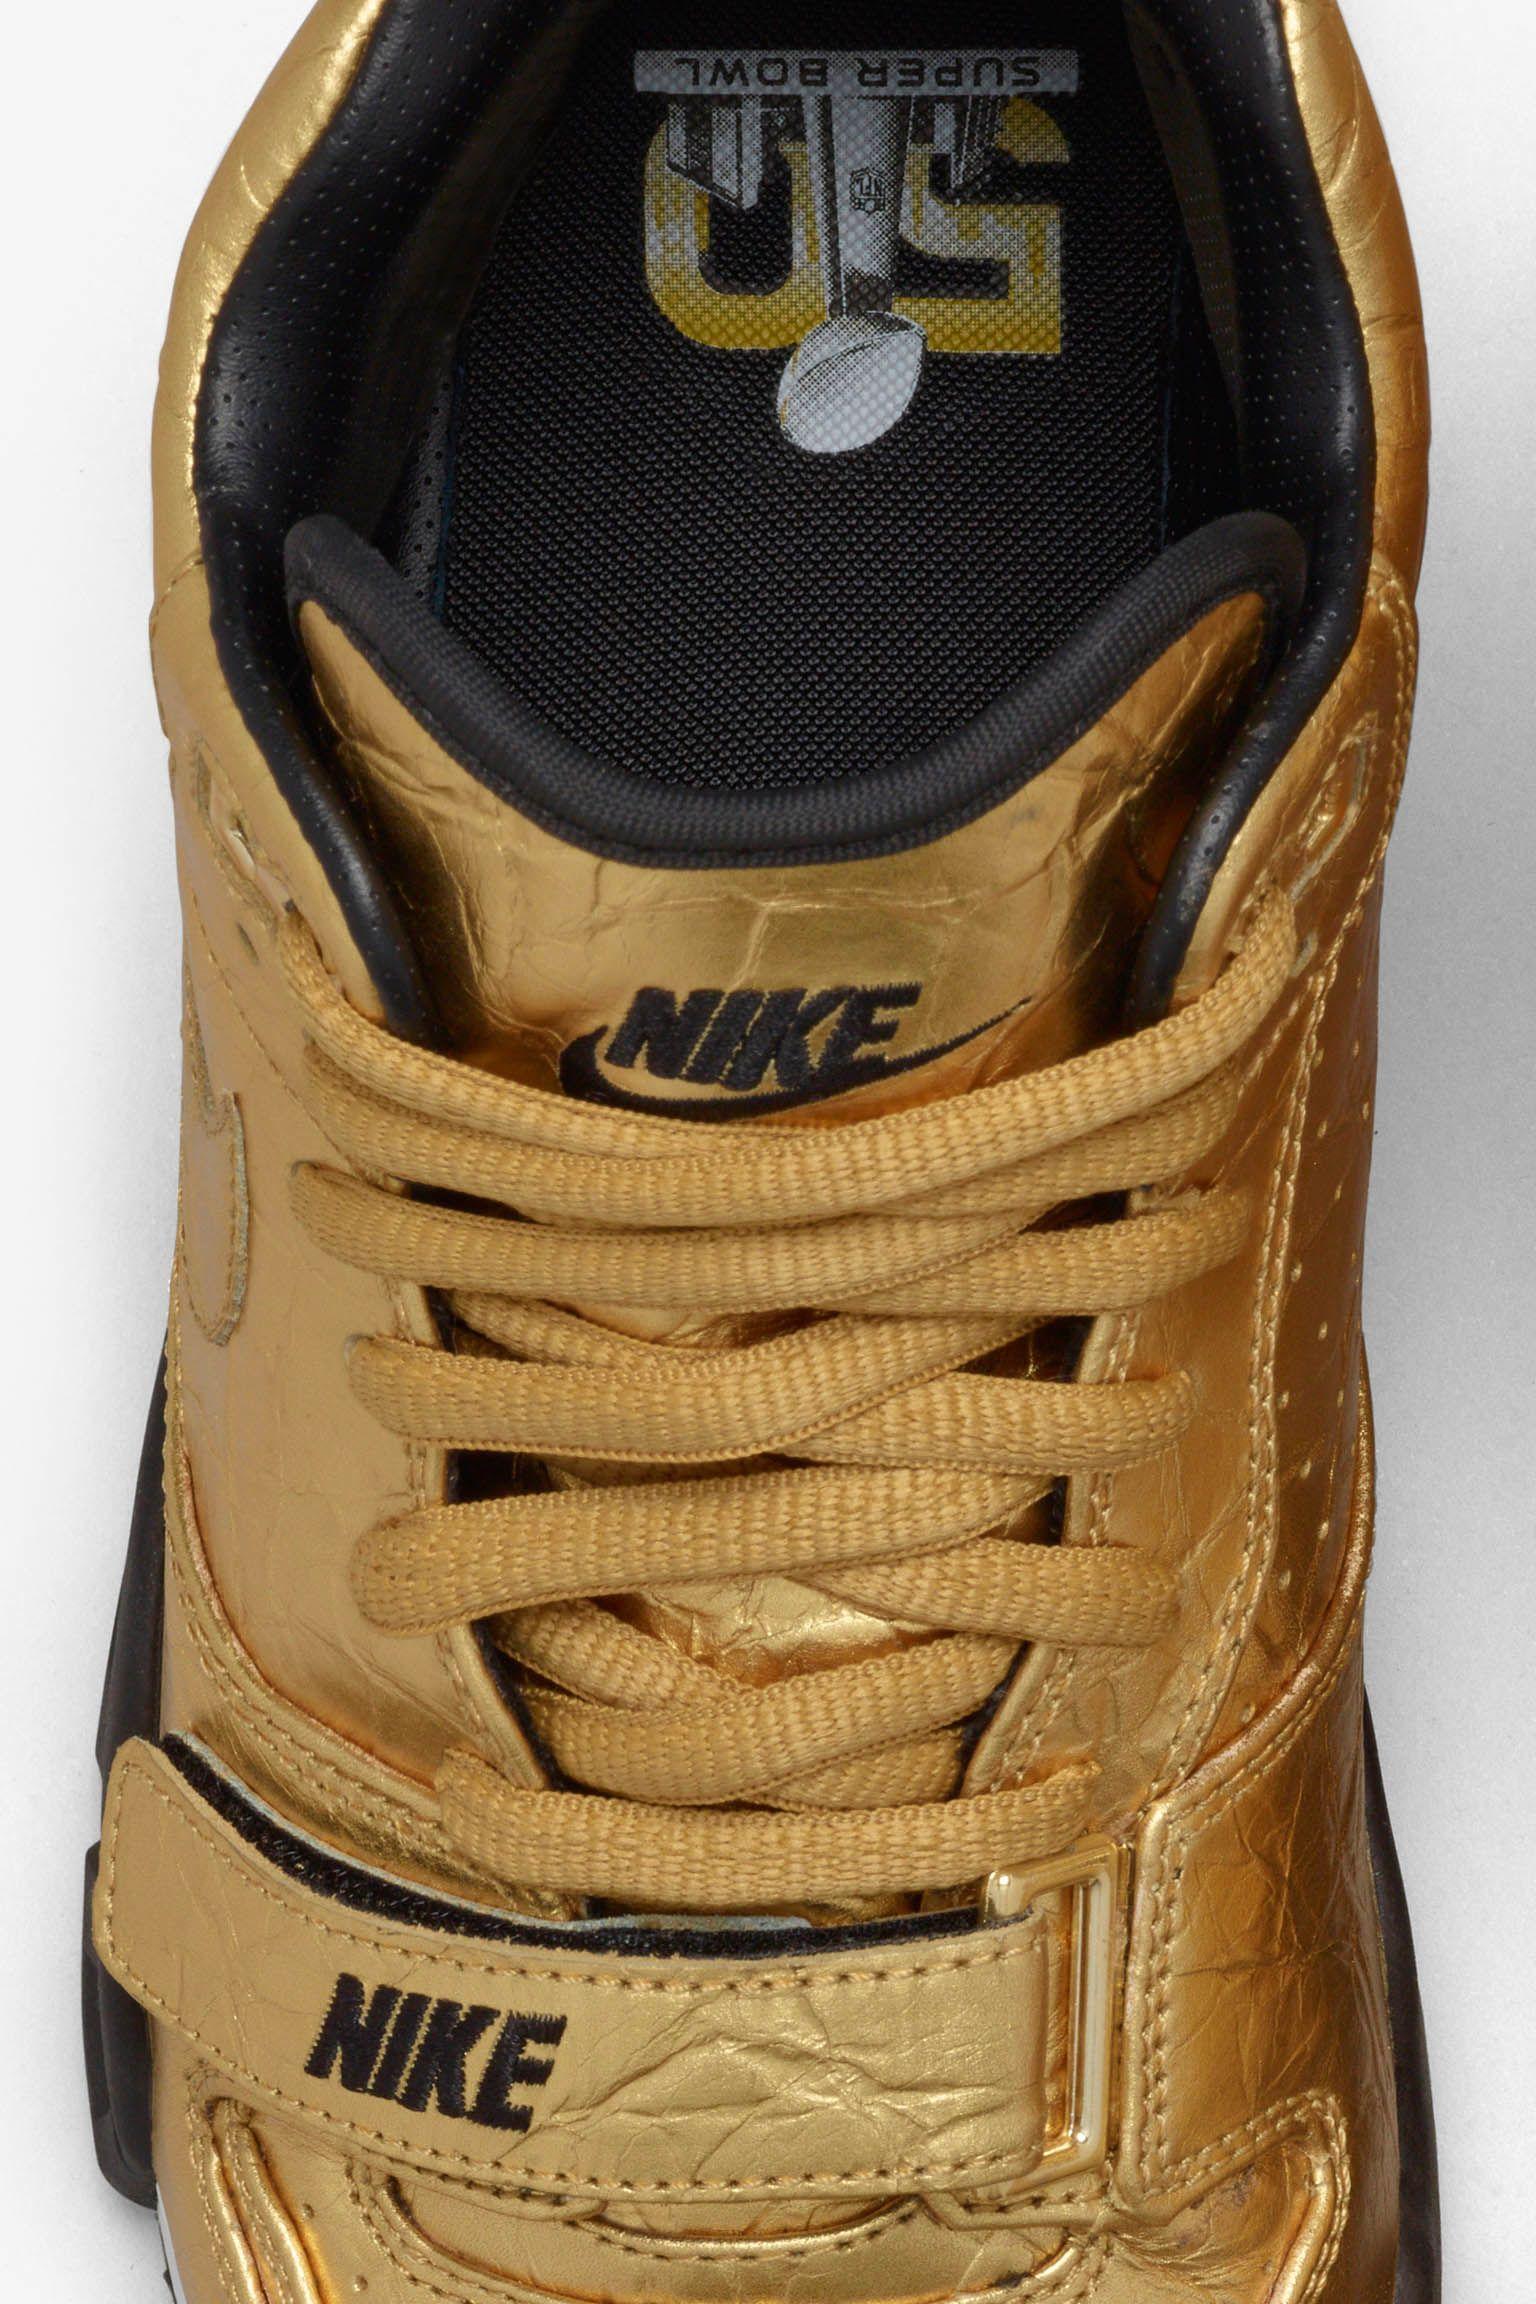 Nike SB50 Nike Air Trainer 1 'Metallic Gold'